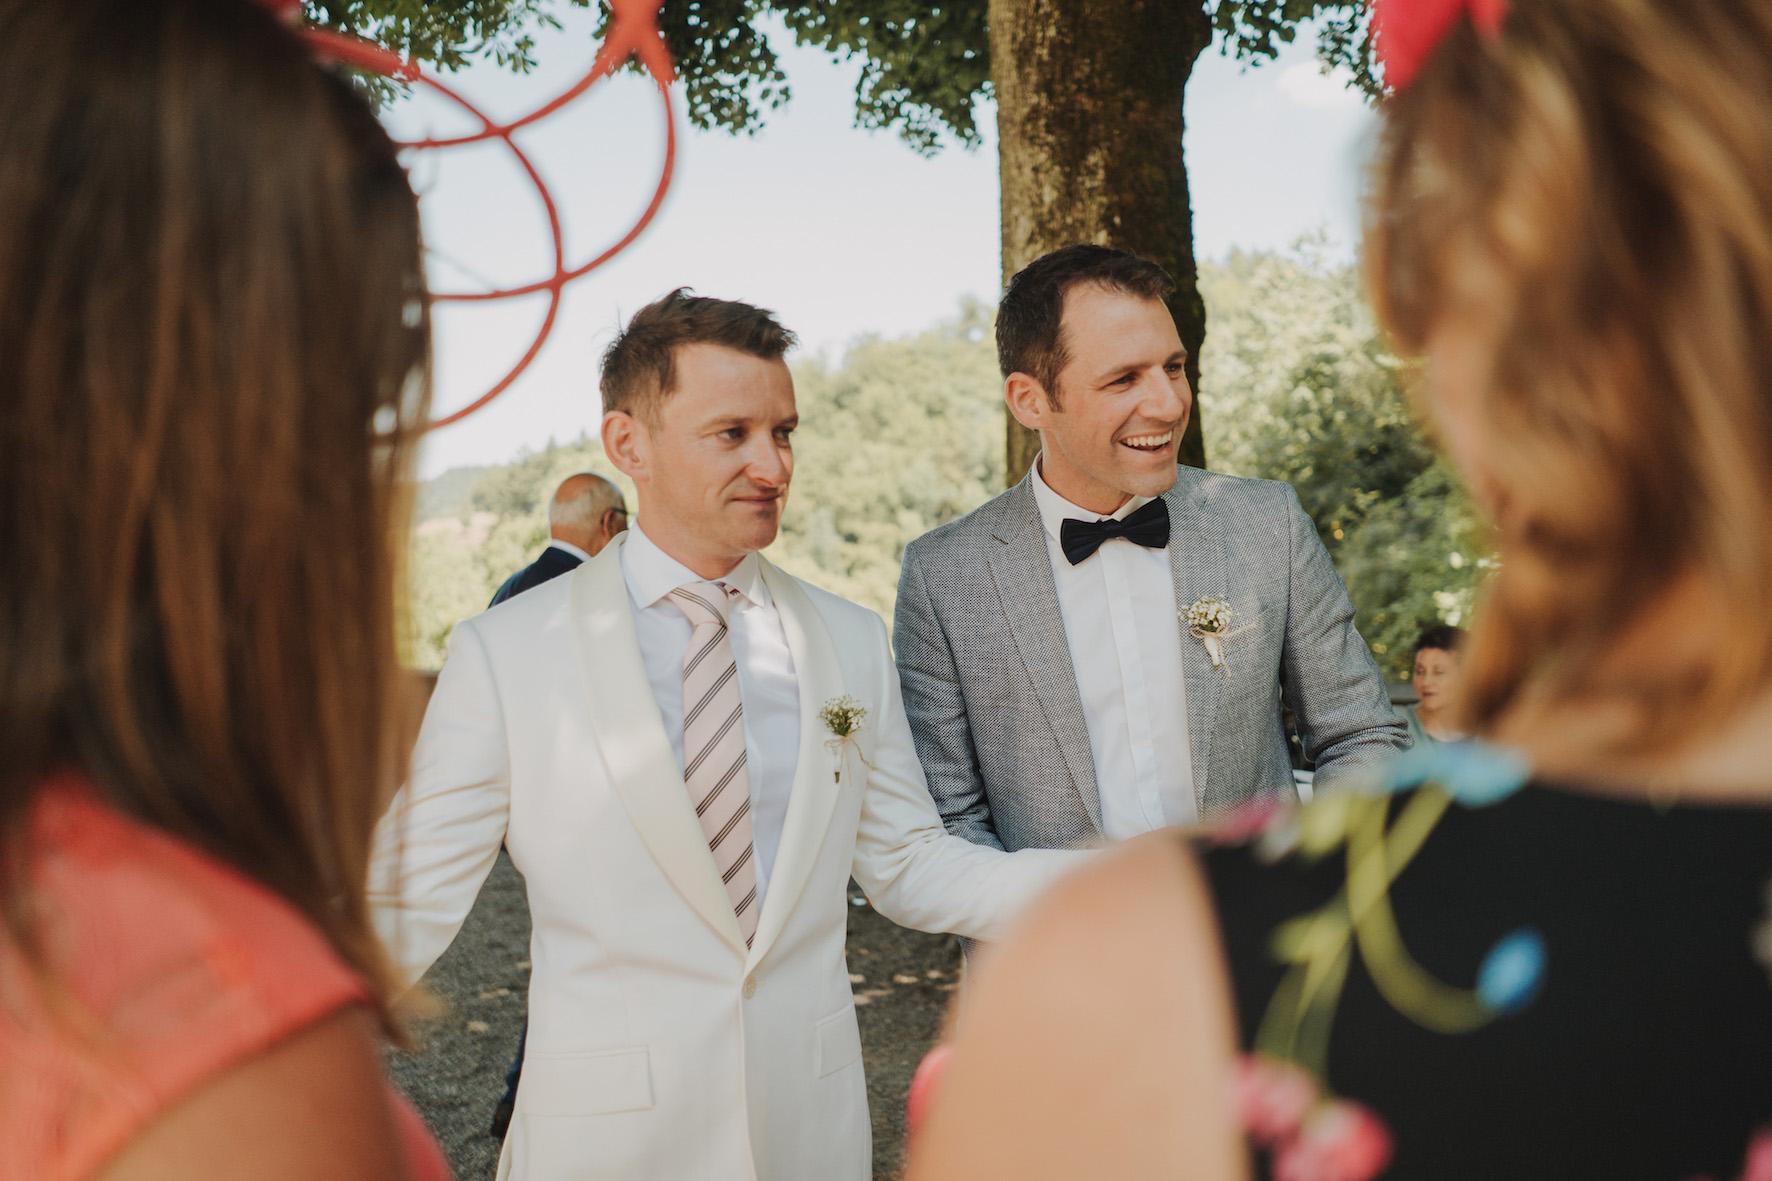 201807274546JC_wedding-0411120180824-Kopie.jpg